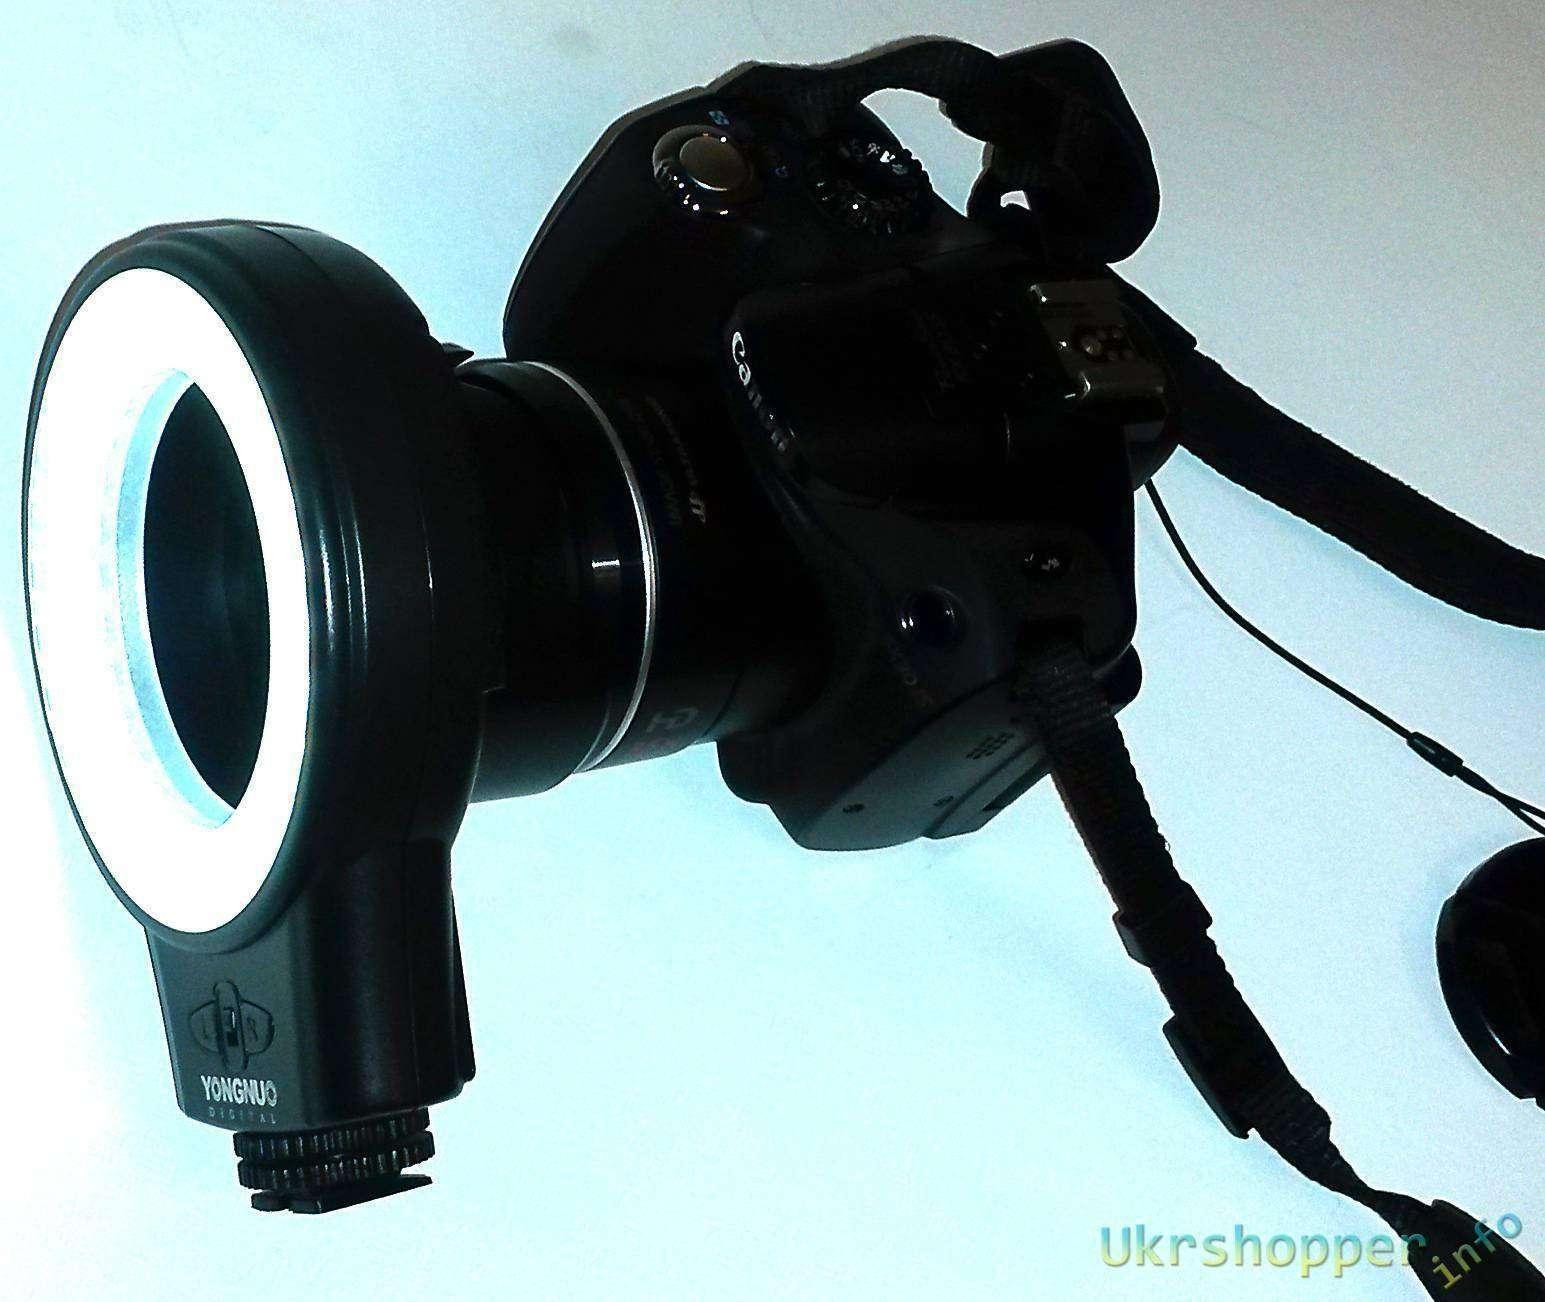 Aliexpress: Обзор кольцевого фото осветителя Yongnuo WJ-60